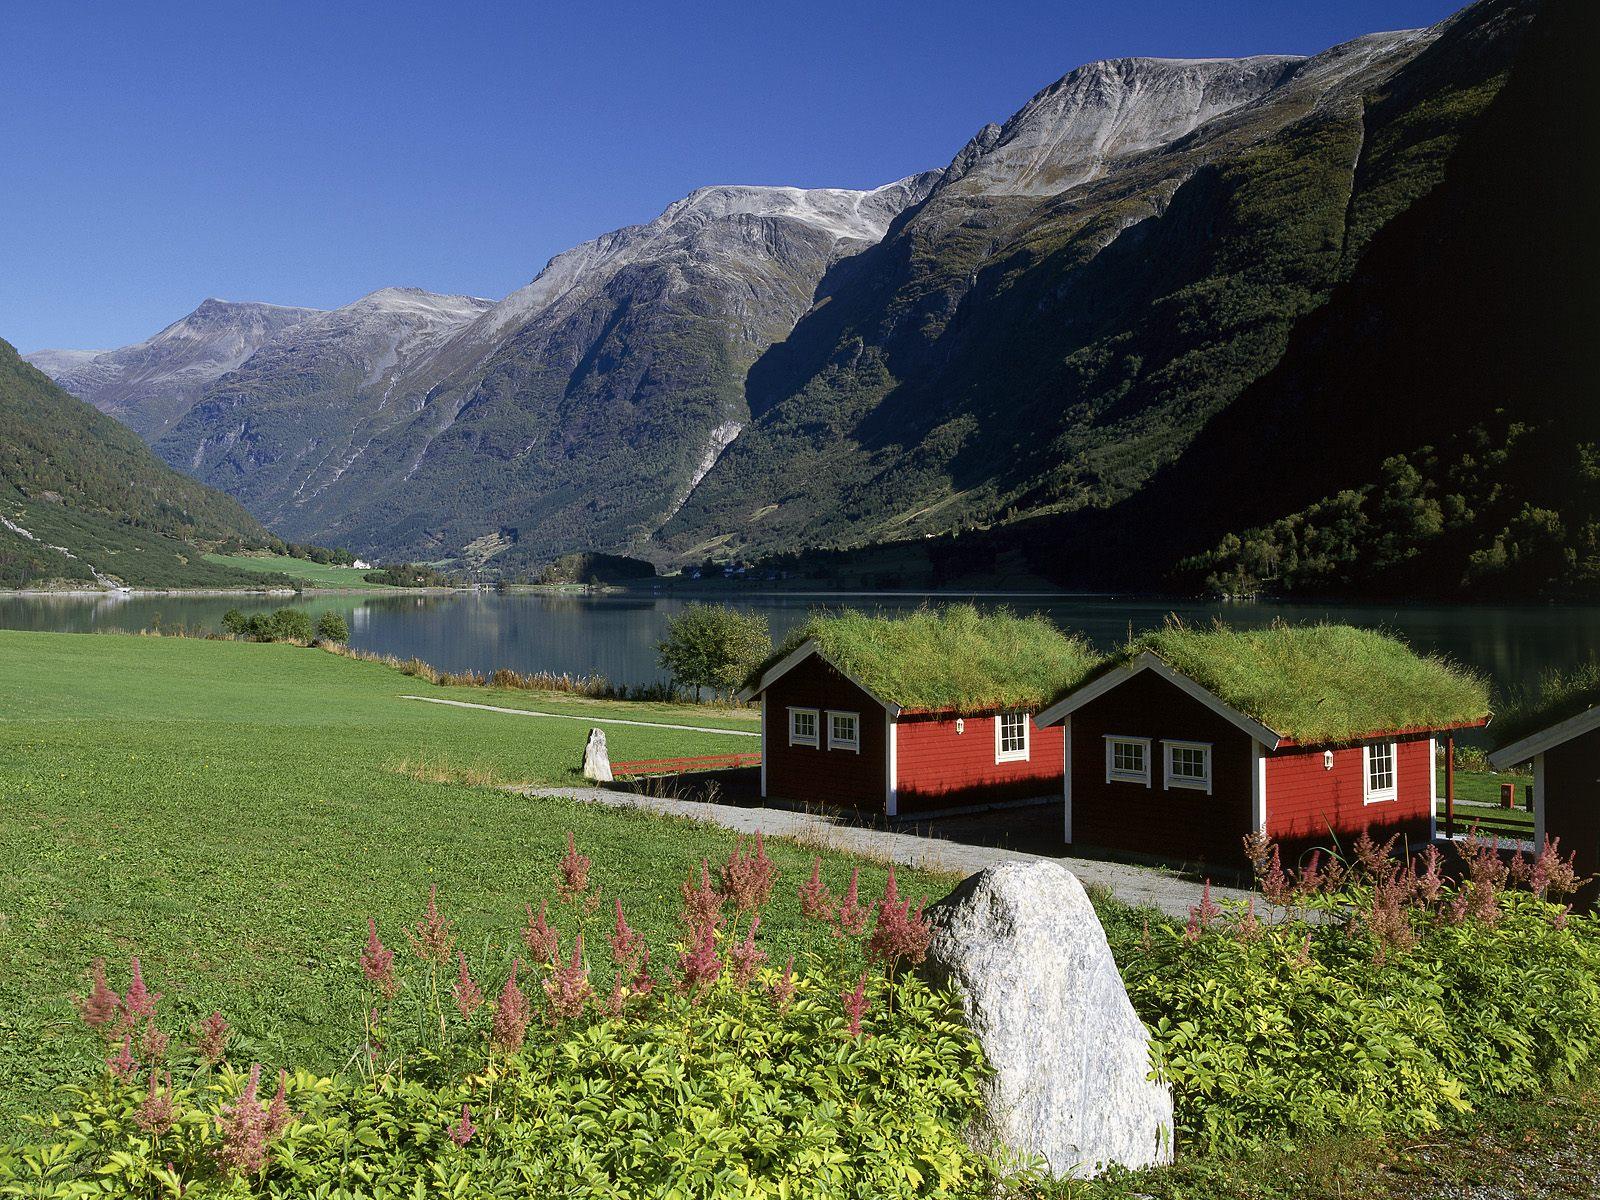 Lakeside Homes Oldenvatnet Norway